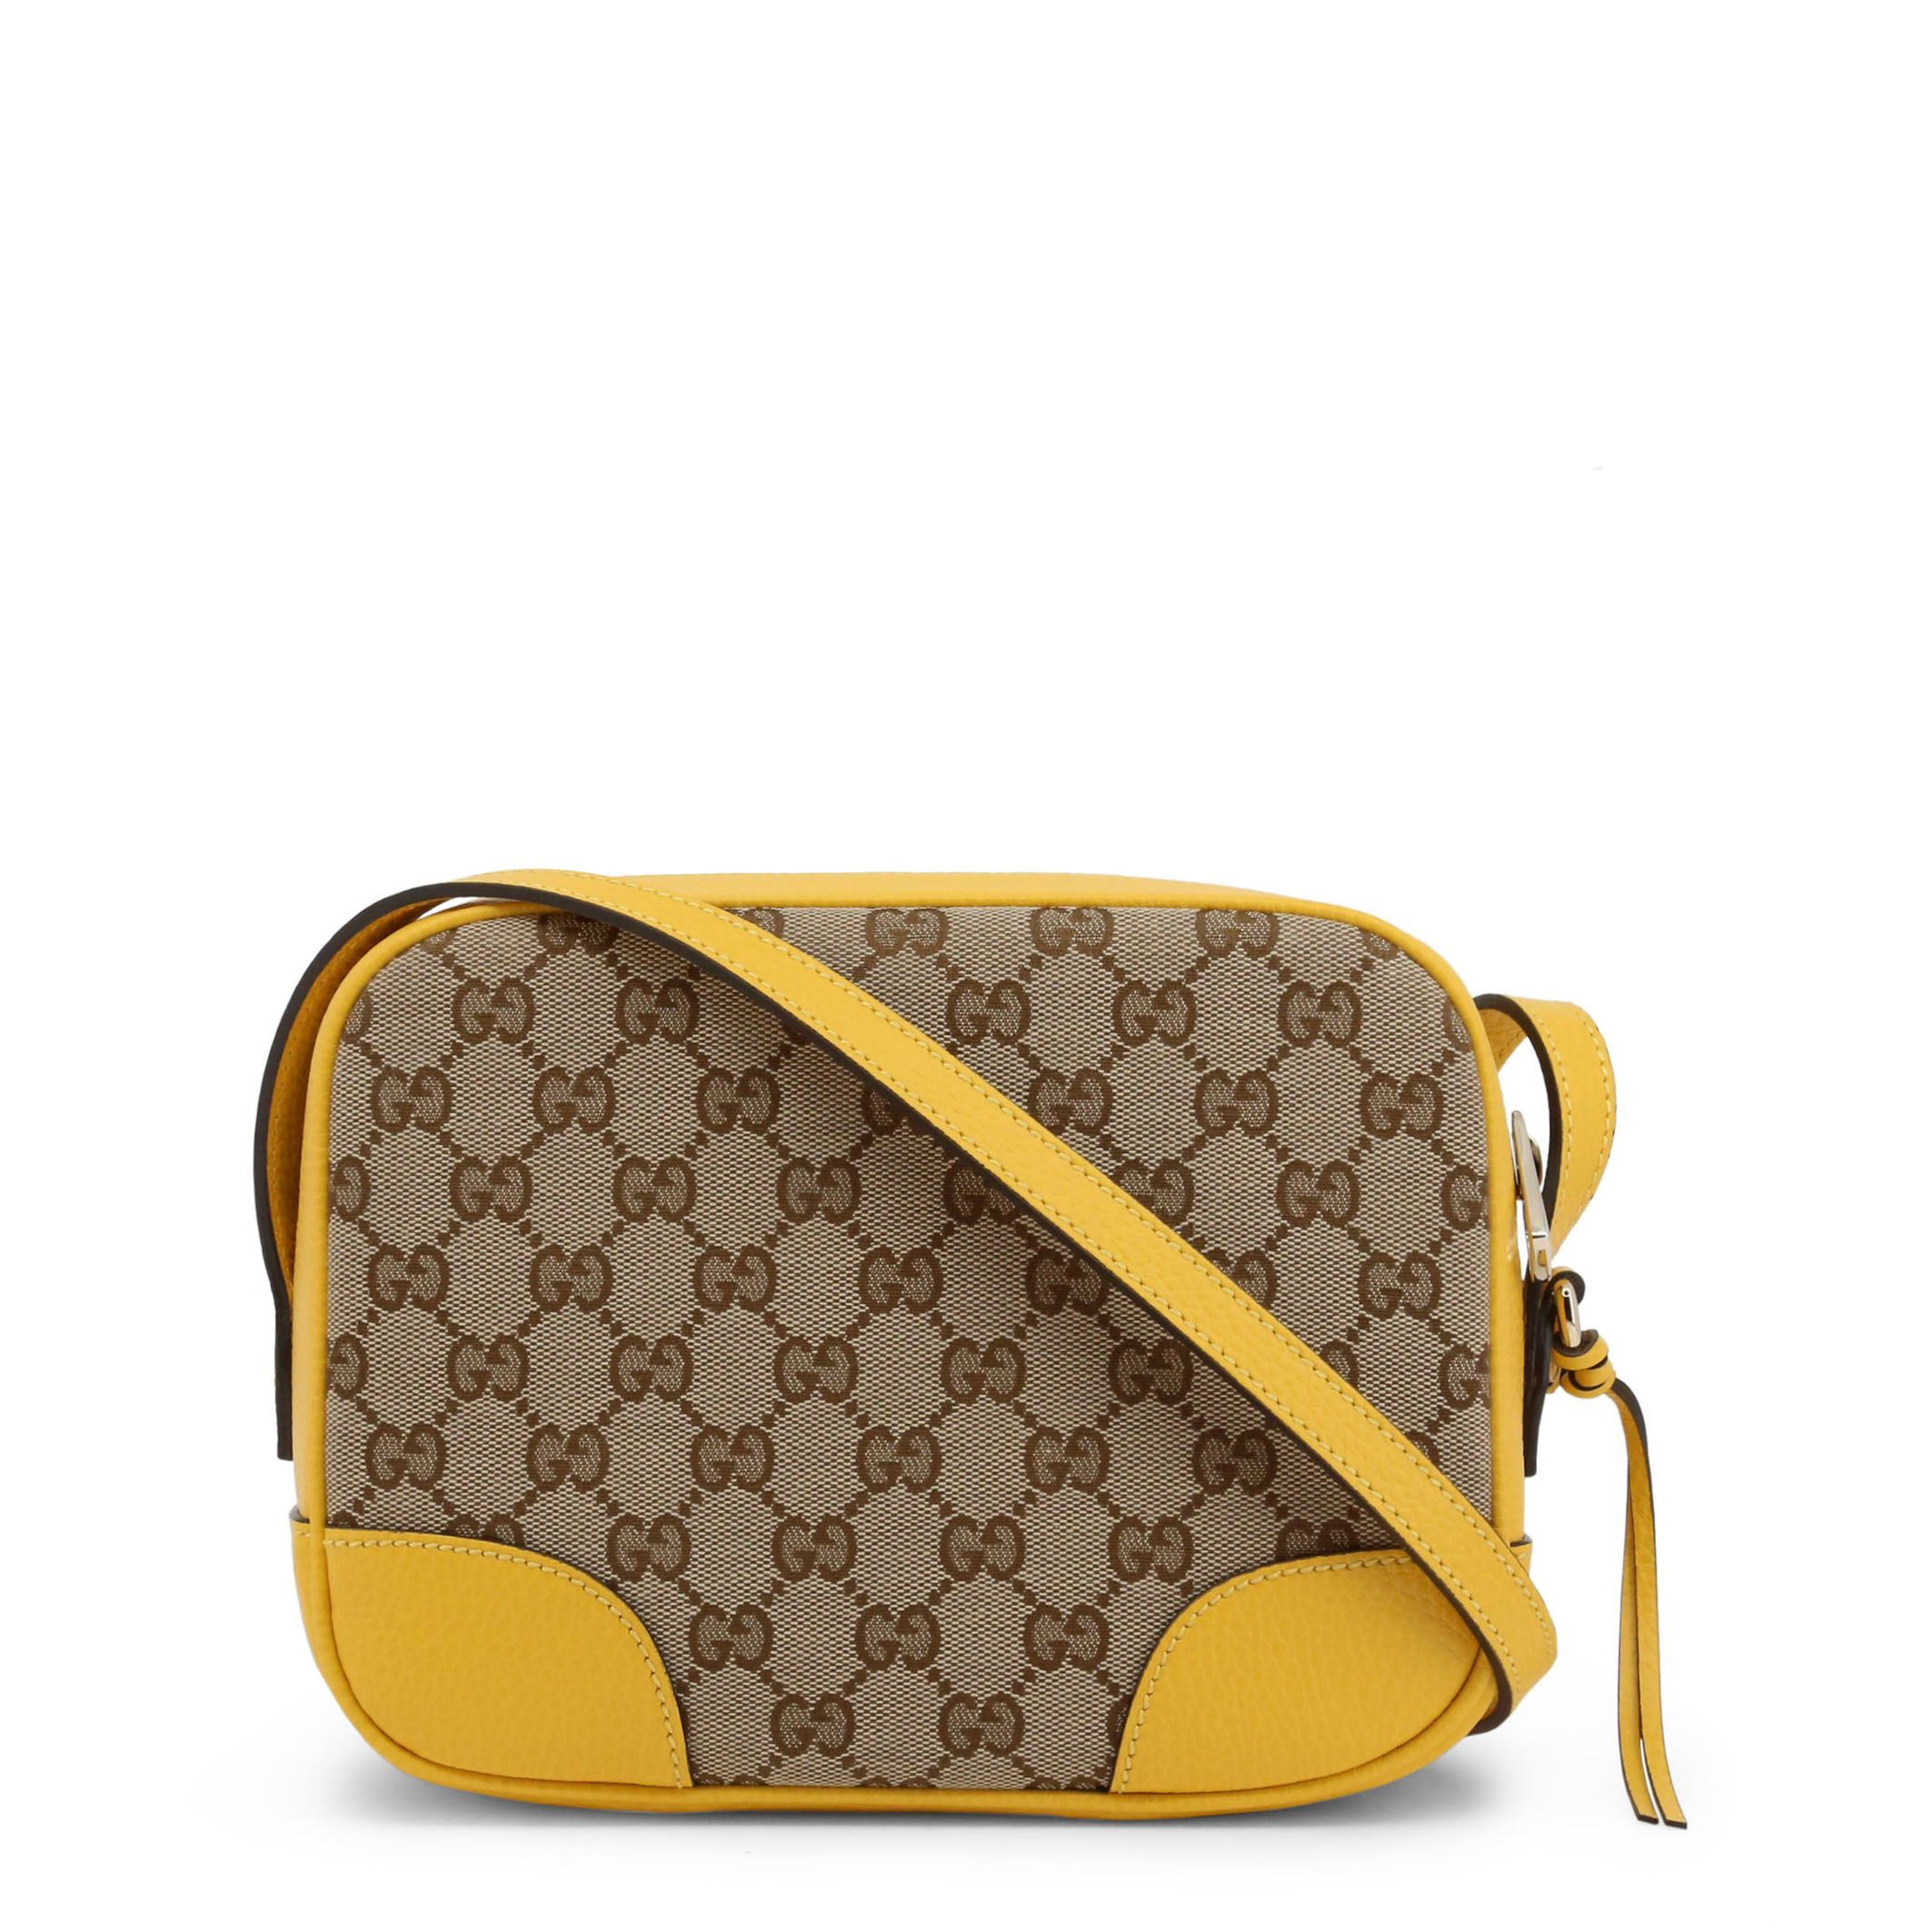 Gucci - 449413_ky9lg - braun 3